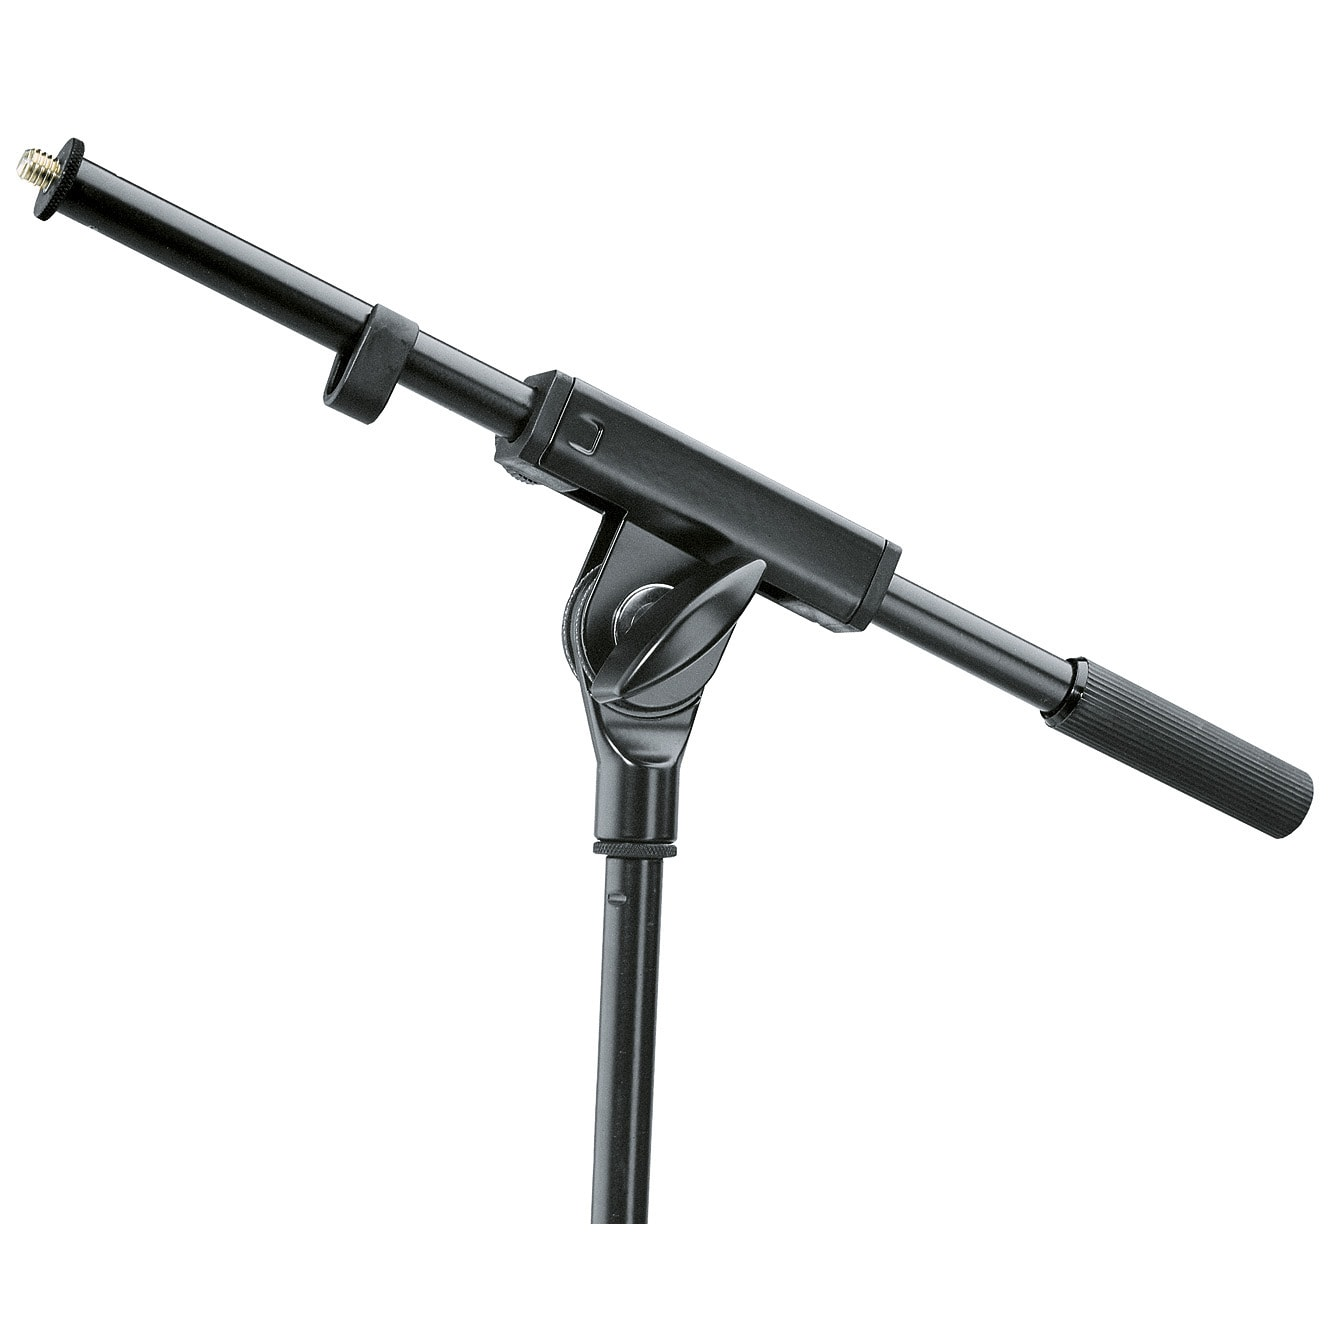 KM21160 - Boom arm